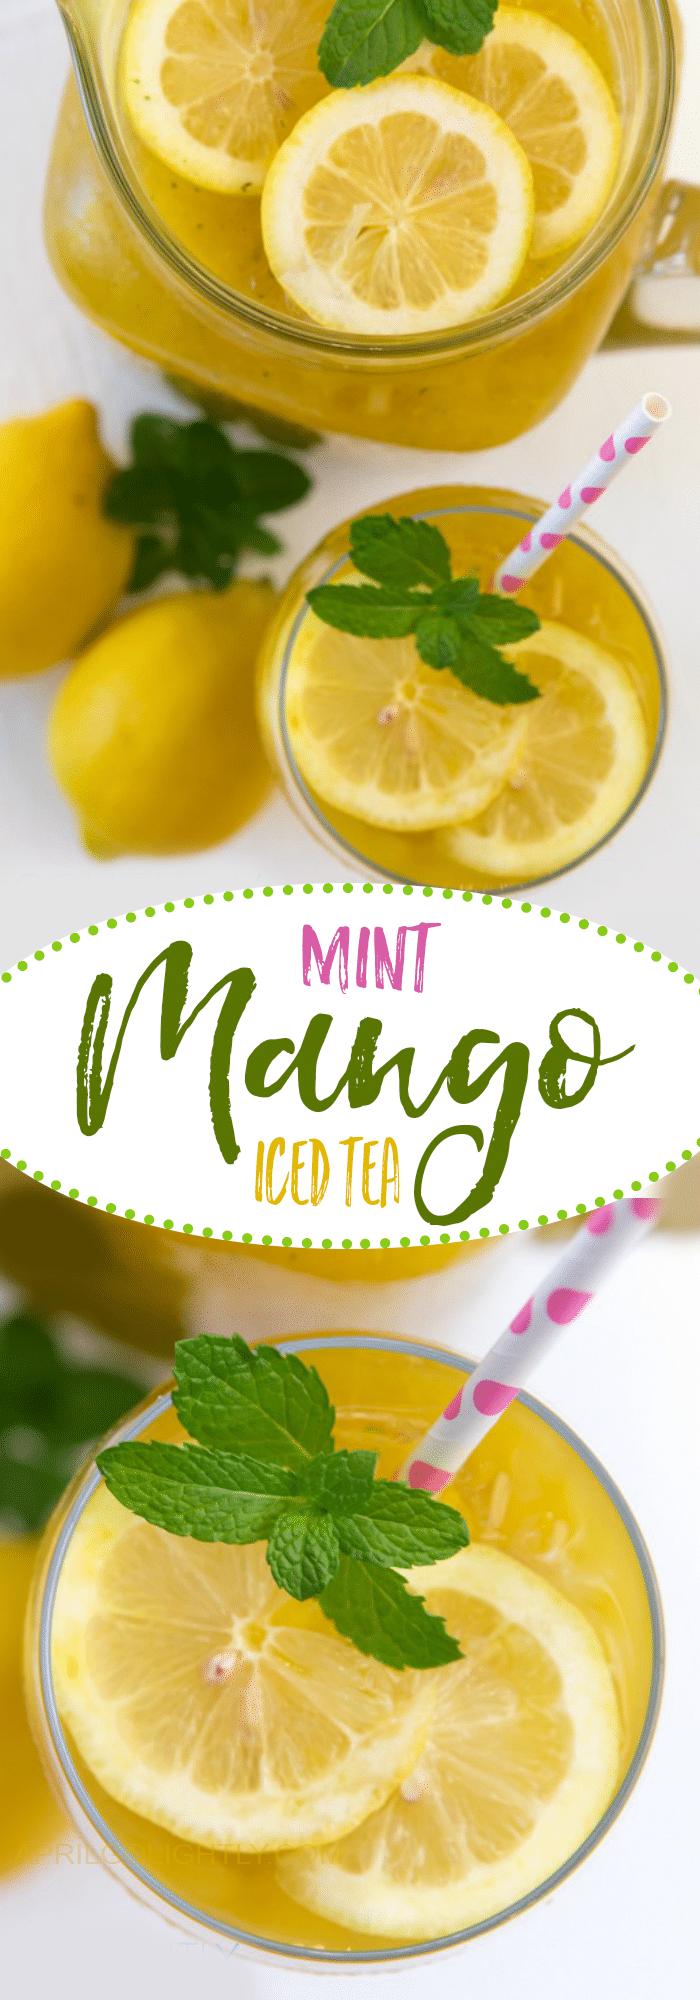 Mango-Mint-Iced-Tea-Drink-Recipe-